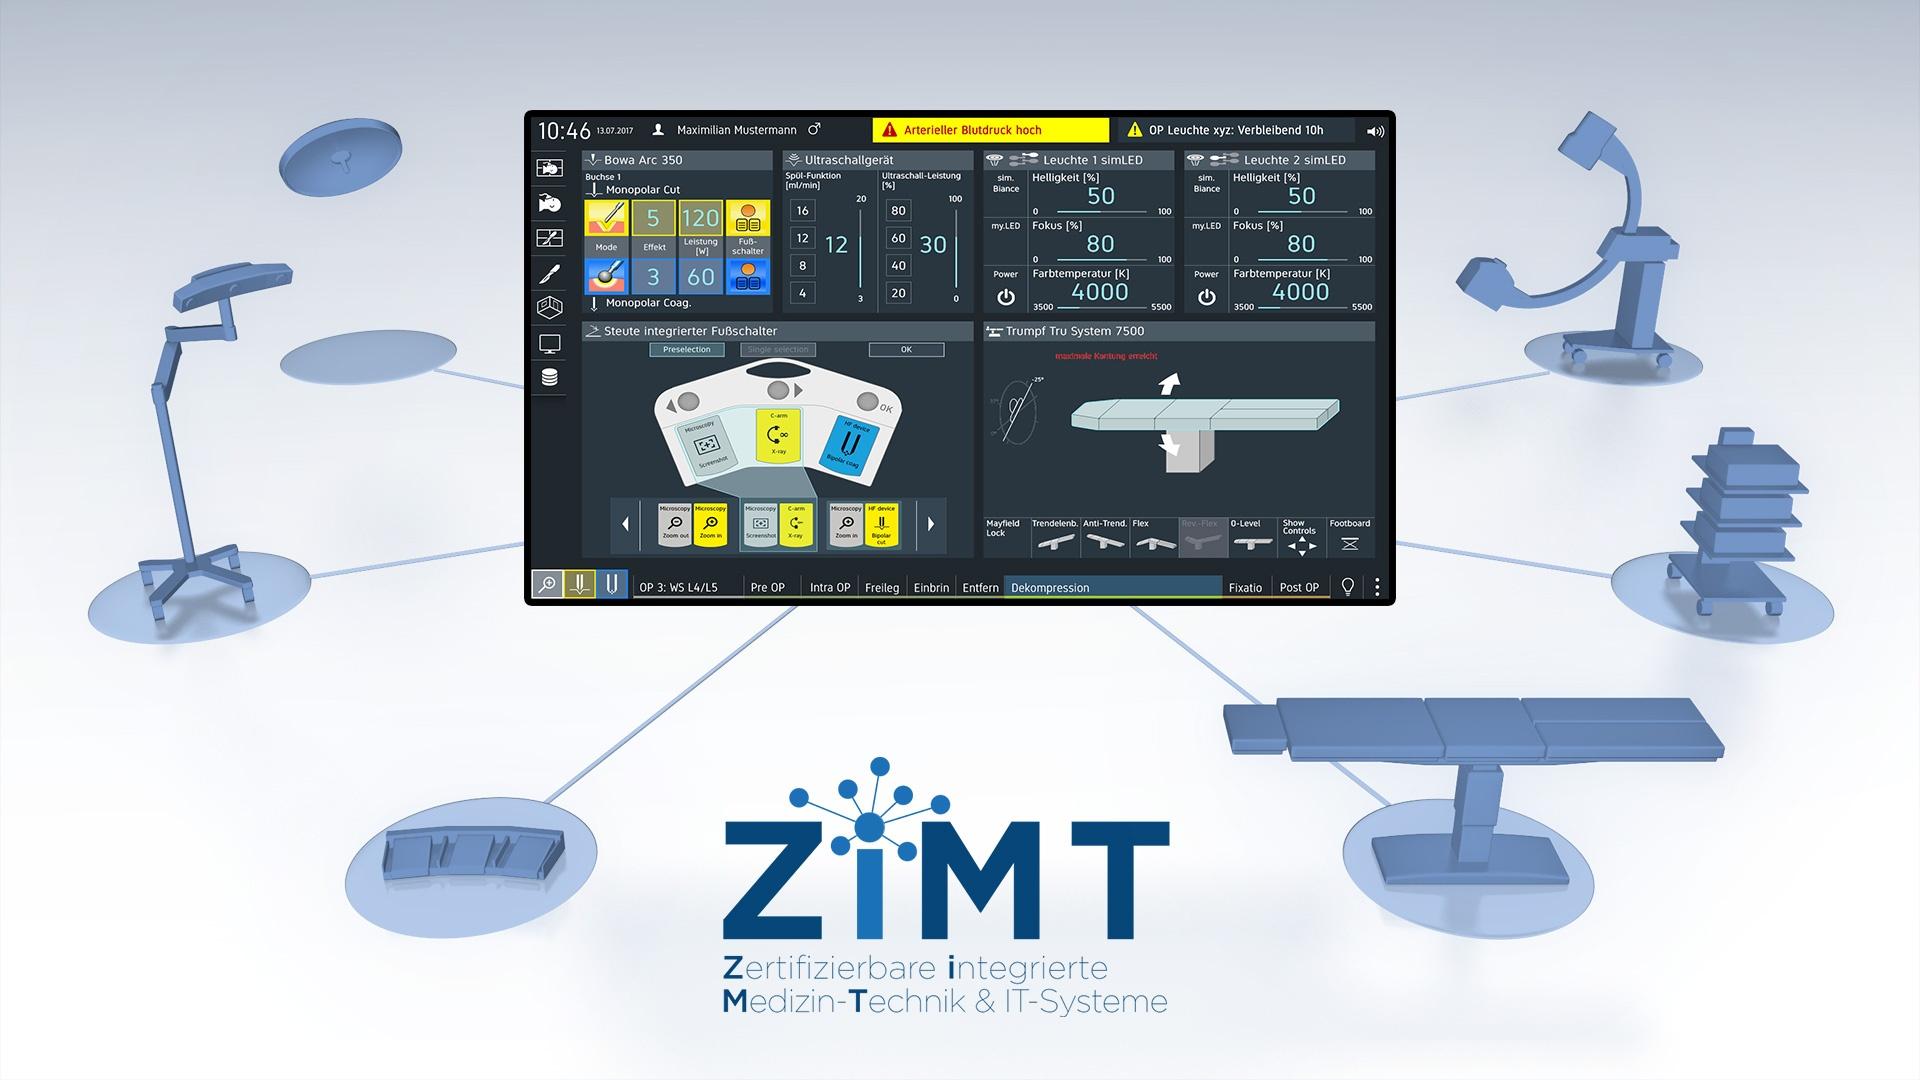 ZiMT_Worksation